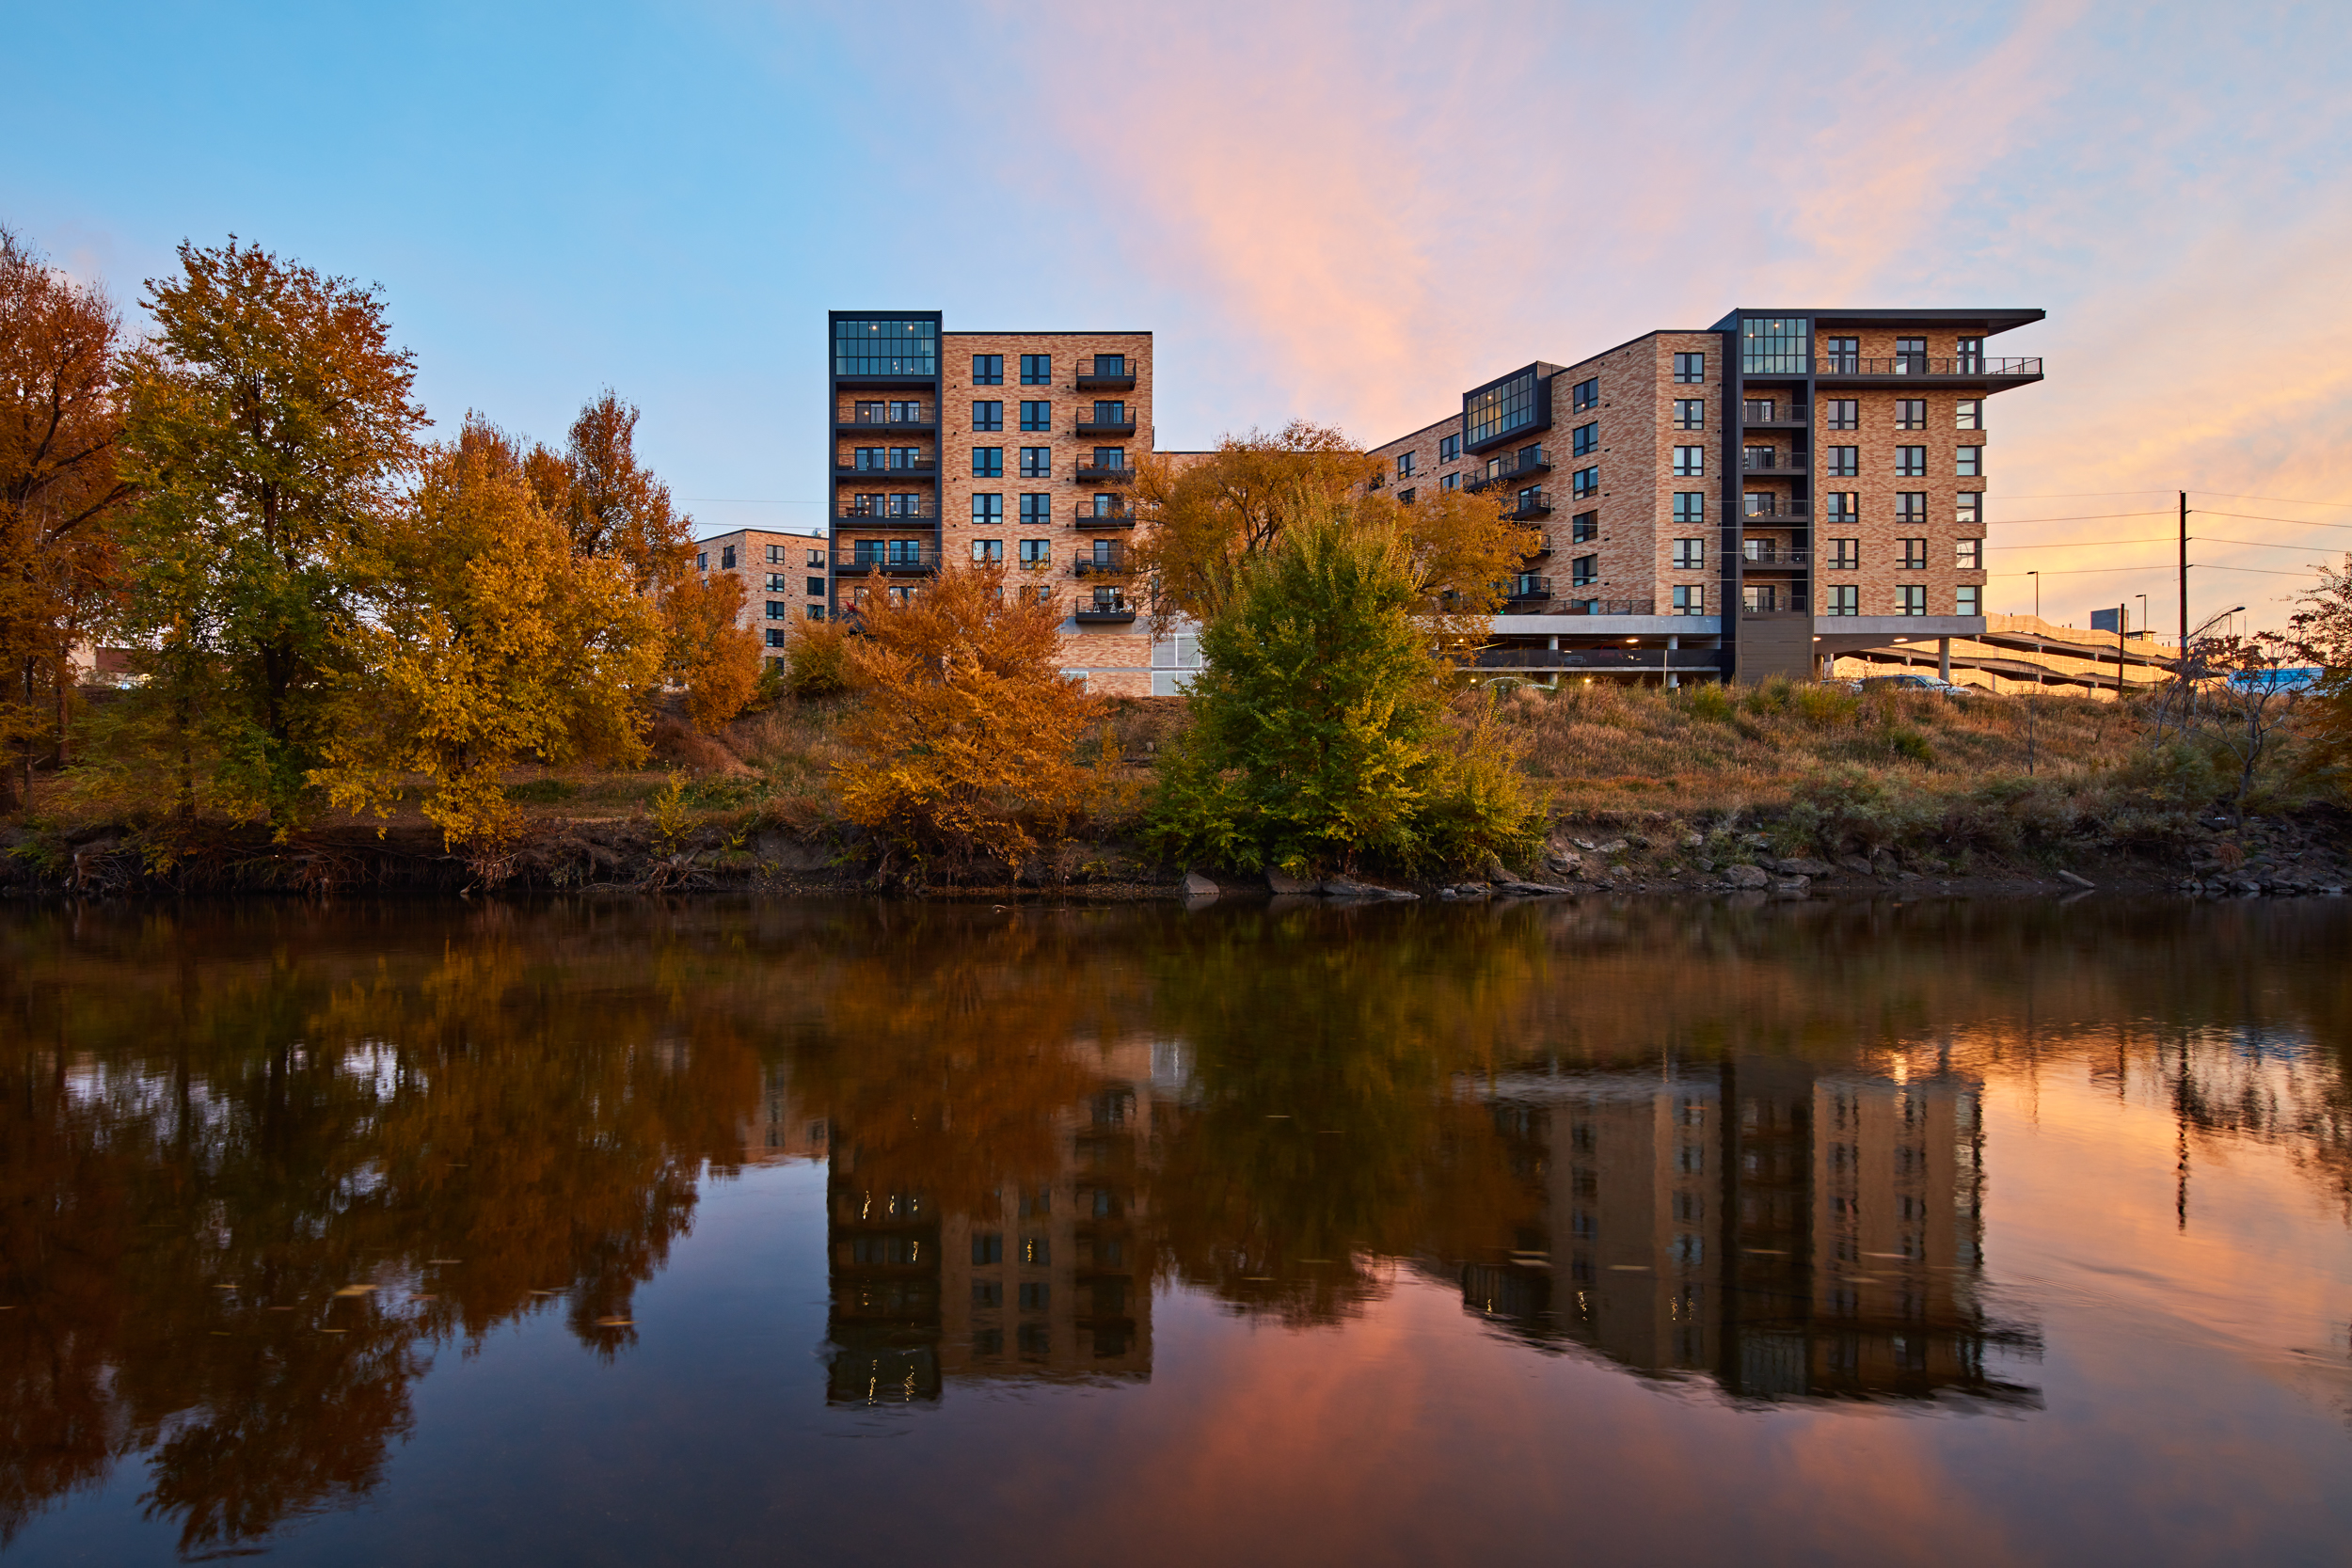 Riverside View of Edison at RiNo by Tom Harris